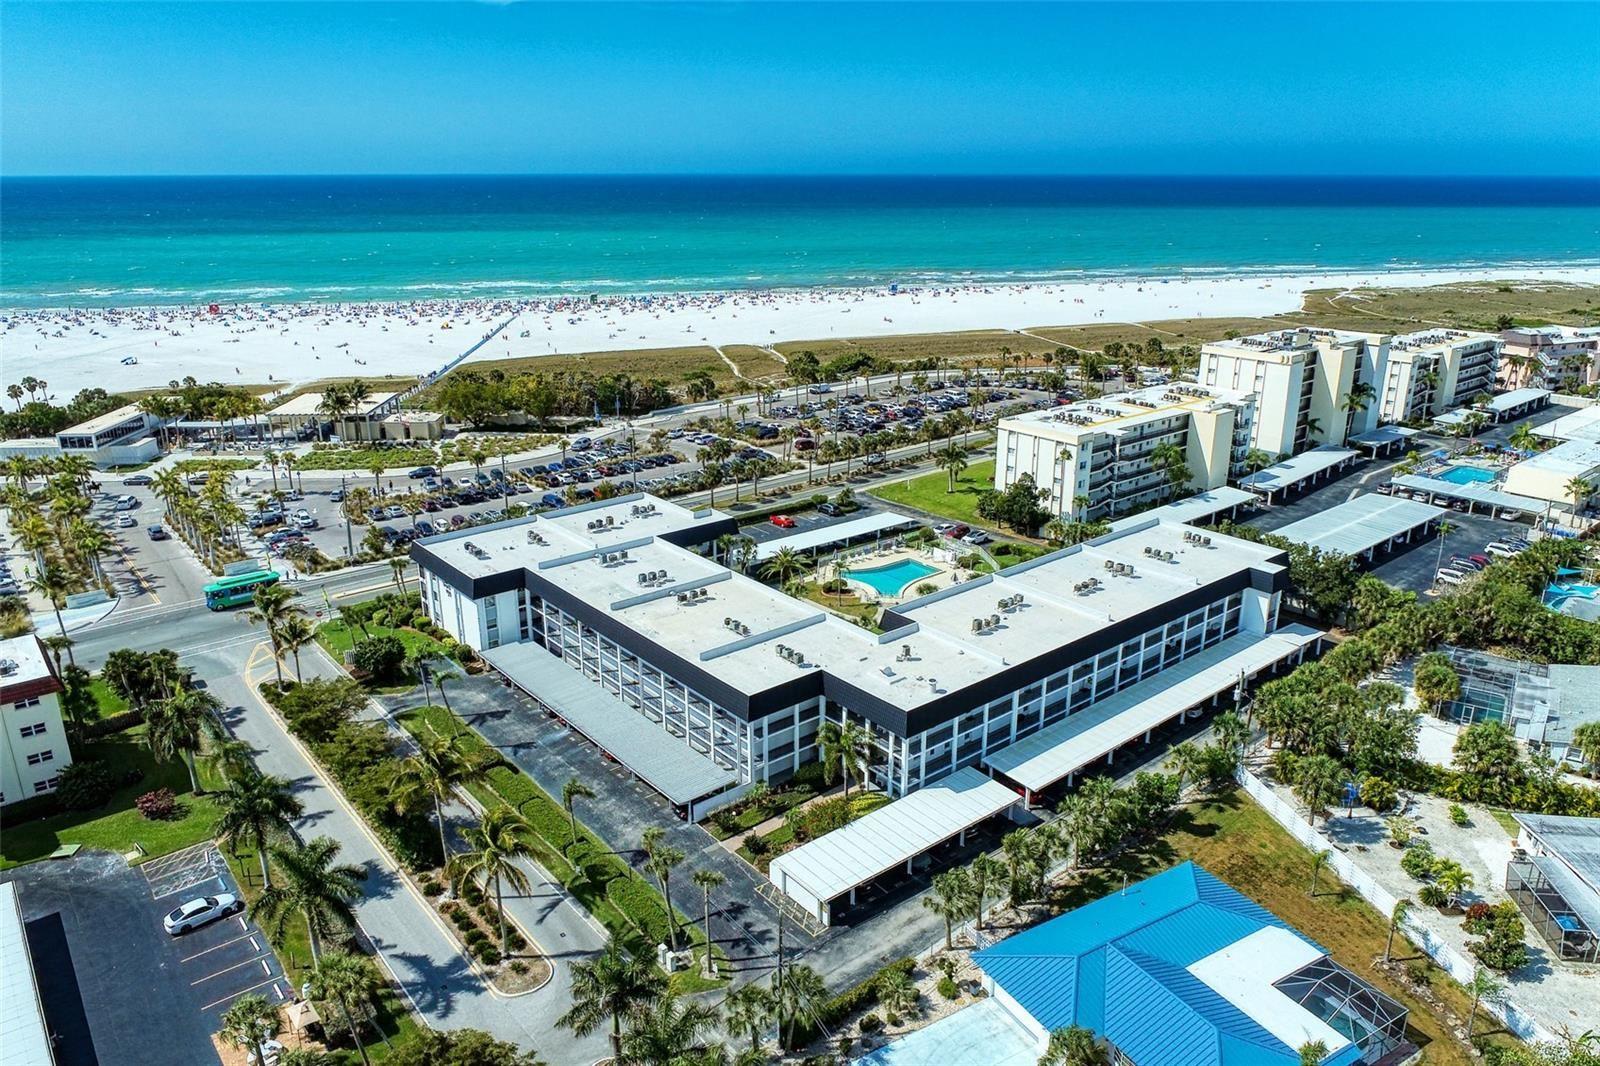 Photo of 5600 BEACH WAY DRIVE #115, SARASOTA, FL 34242 (MLS # A4508336)